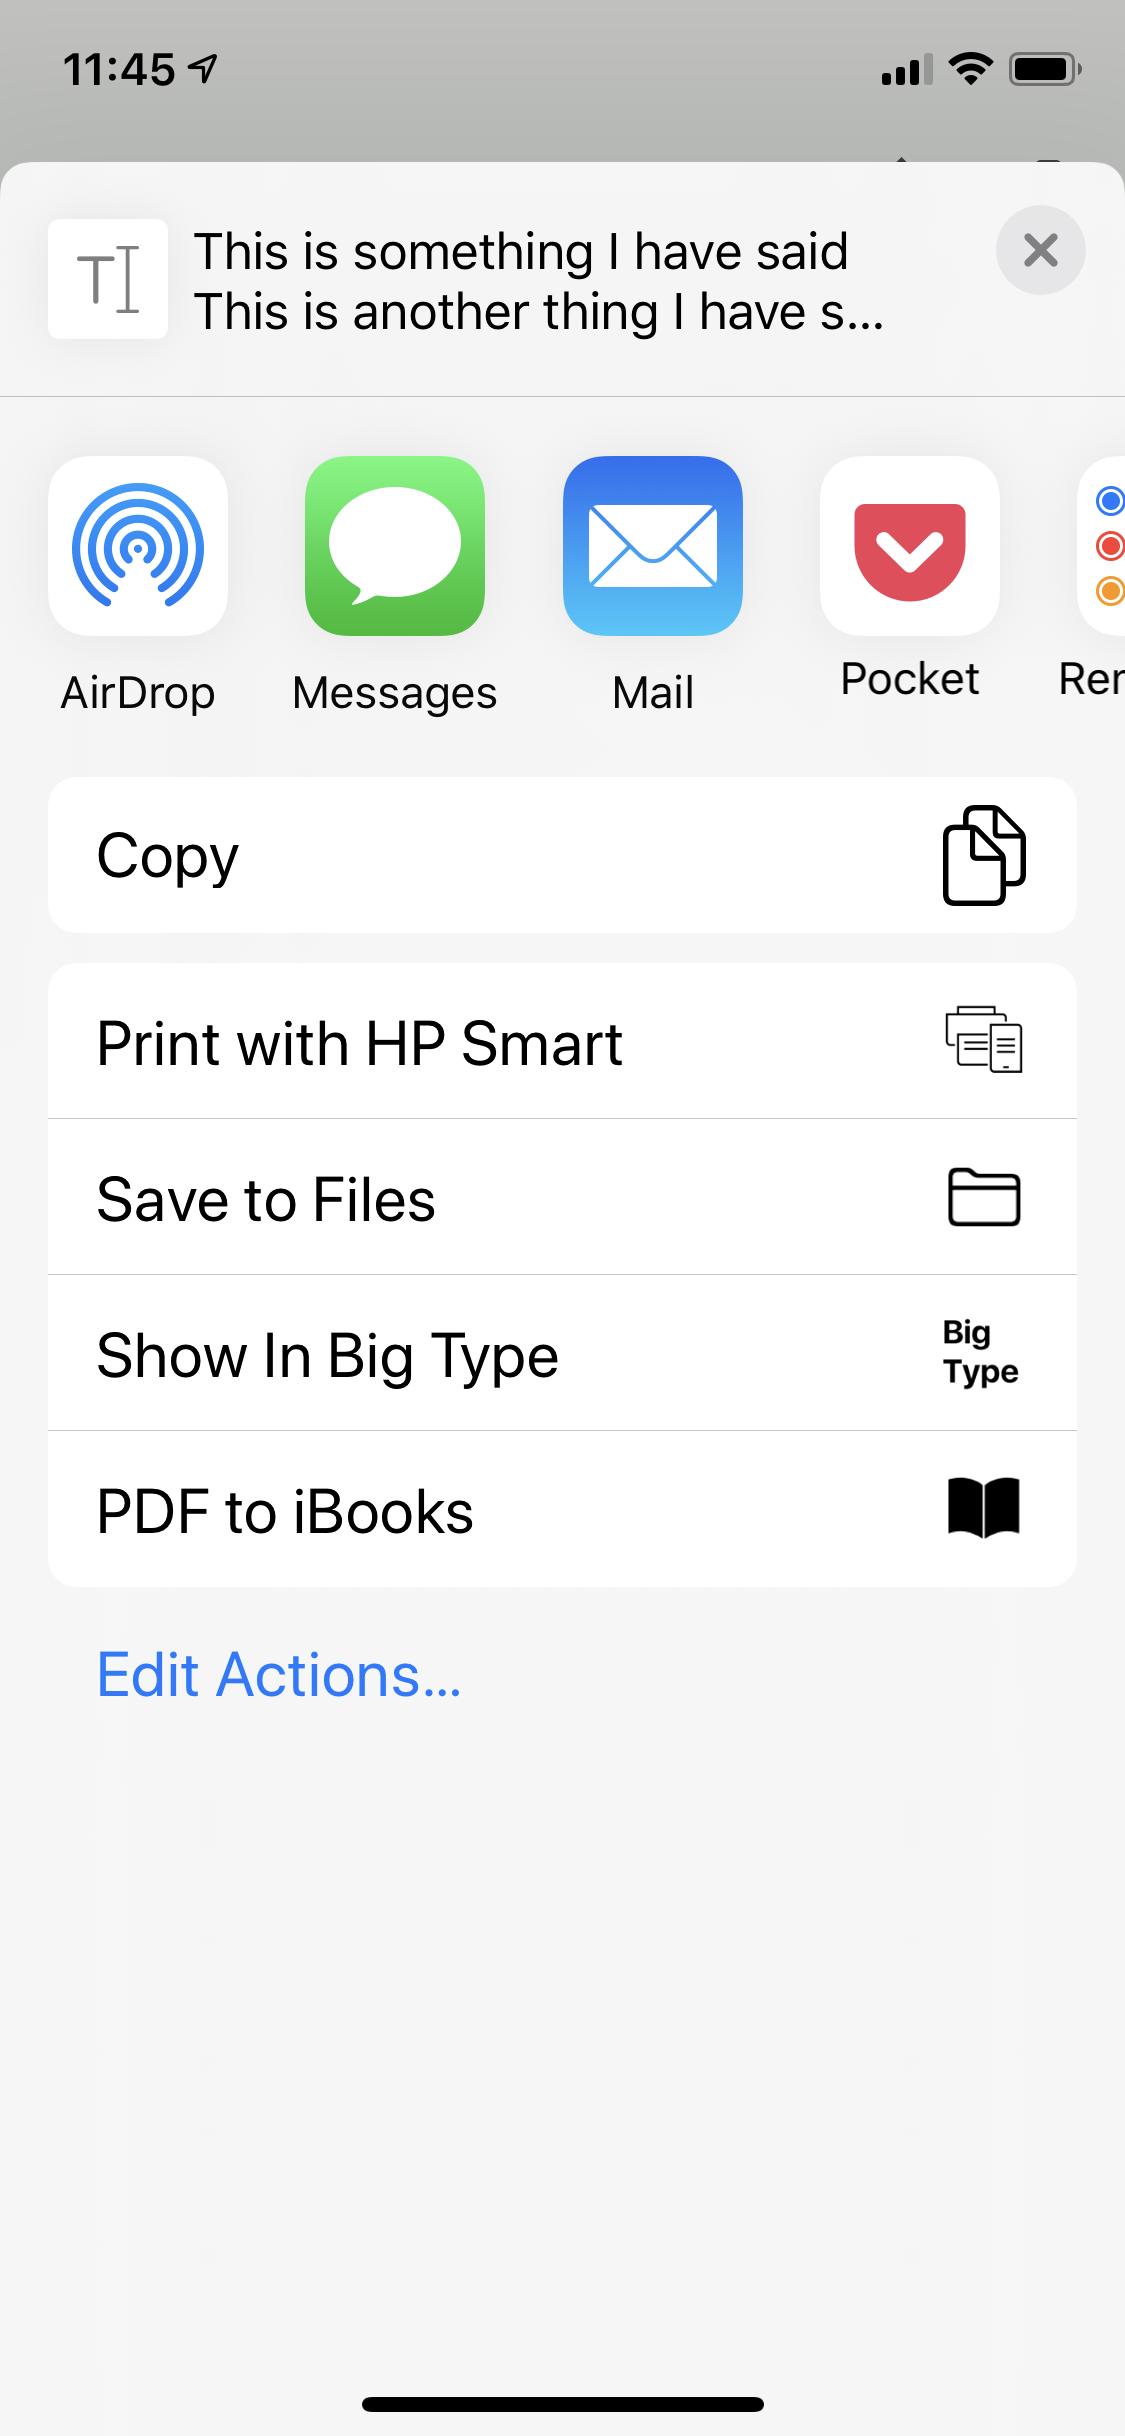 iOS Share Sheet invoked from the History screen.